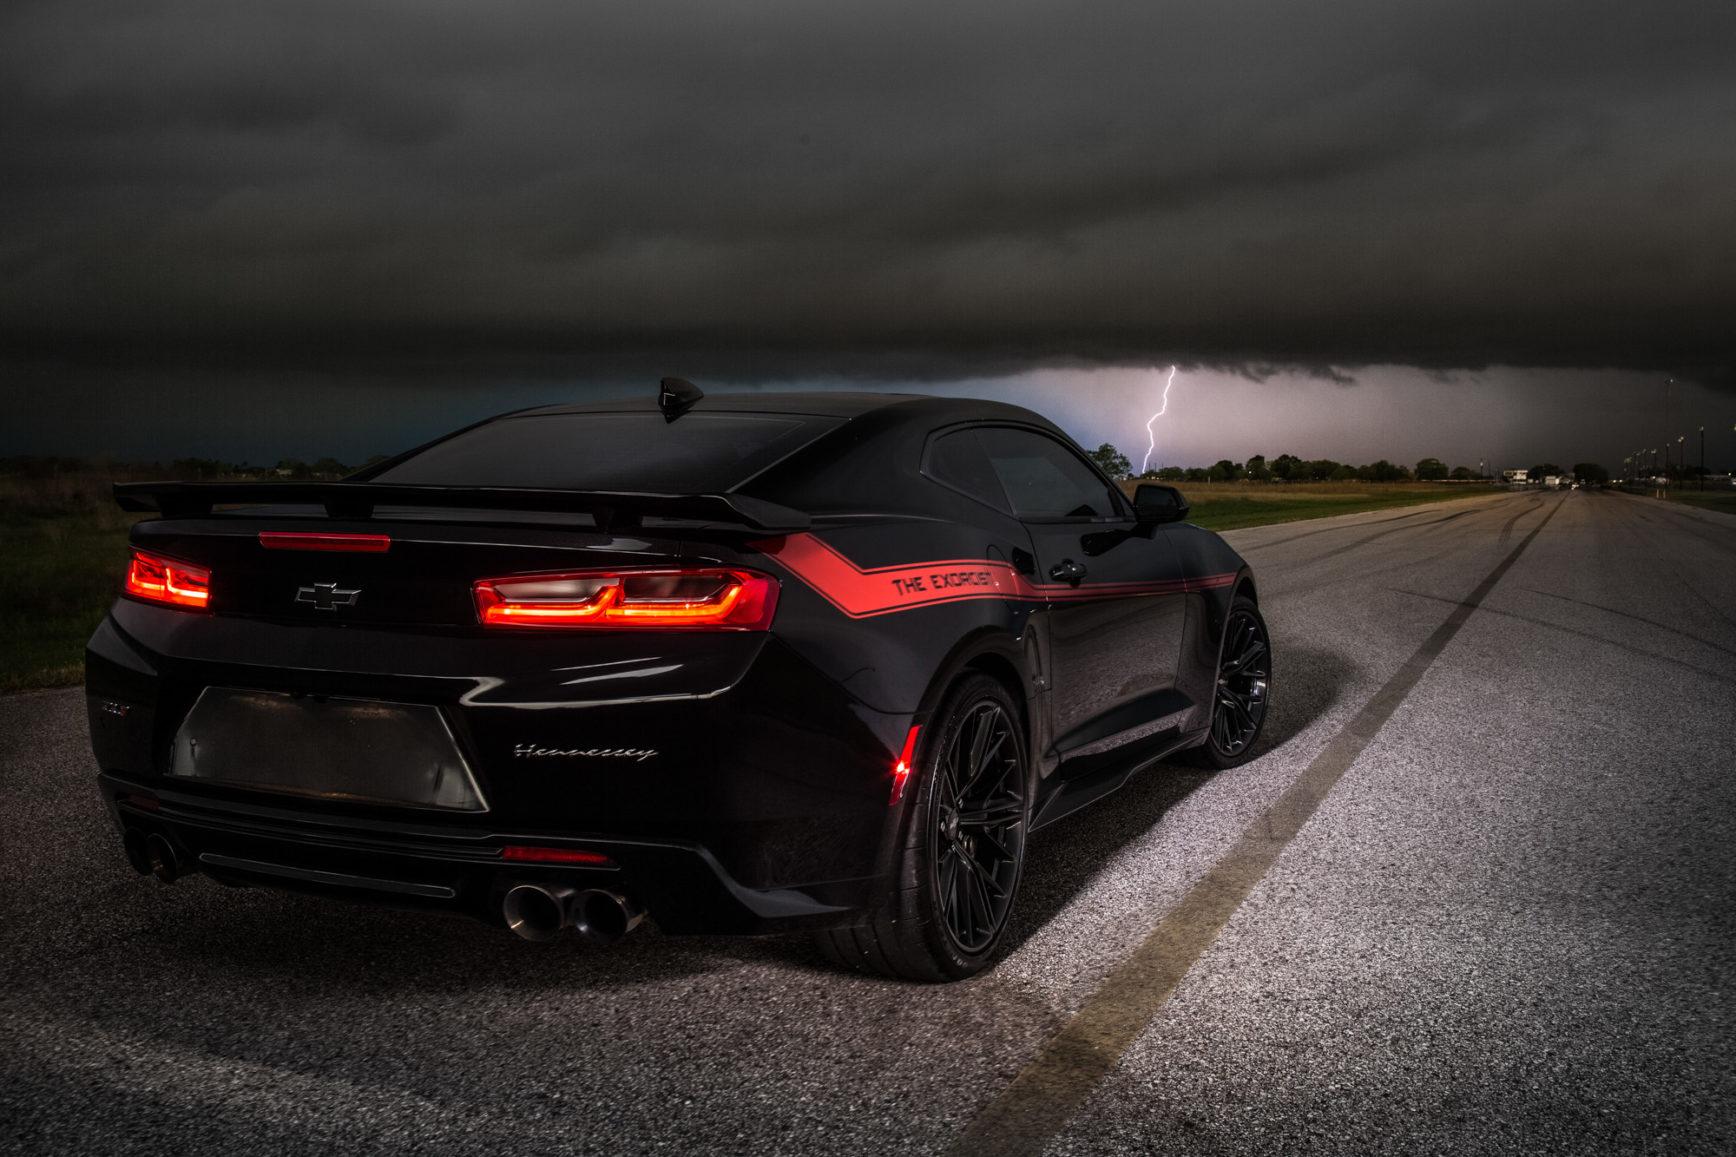 Exorcist-Hennessey-Camaro-ZL1-2017-rear